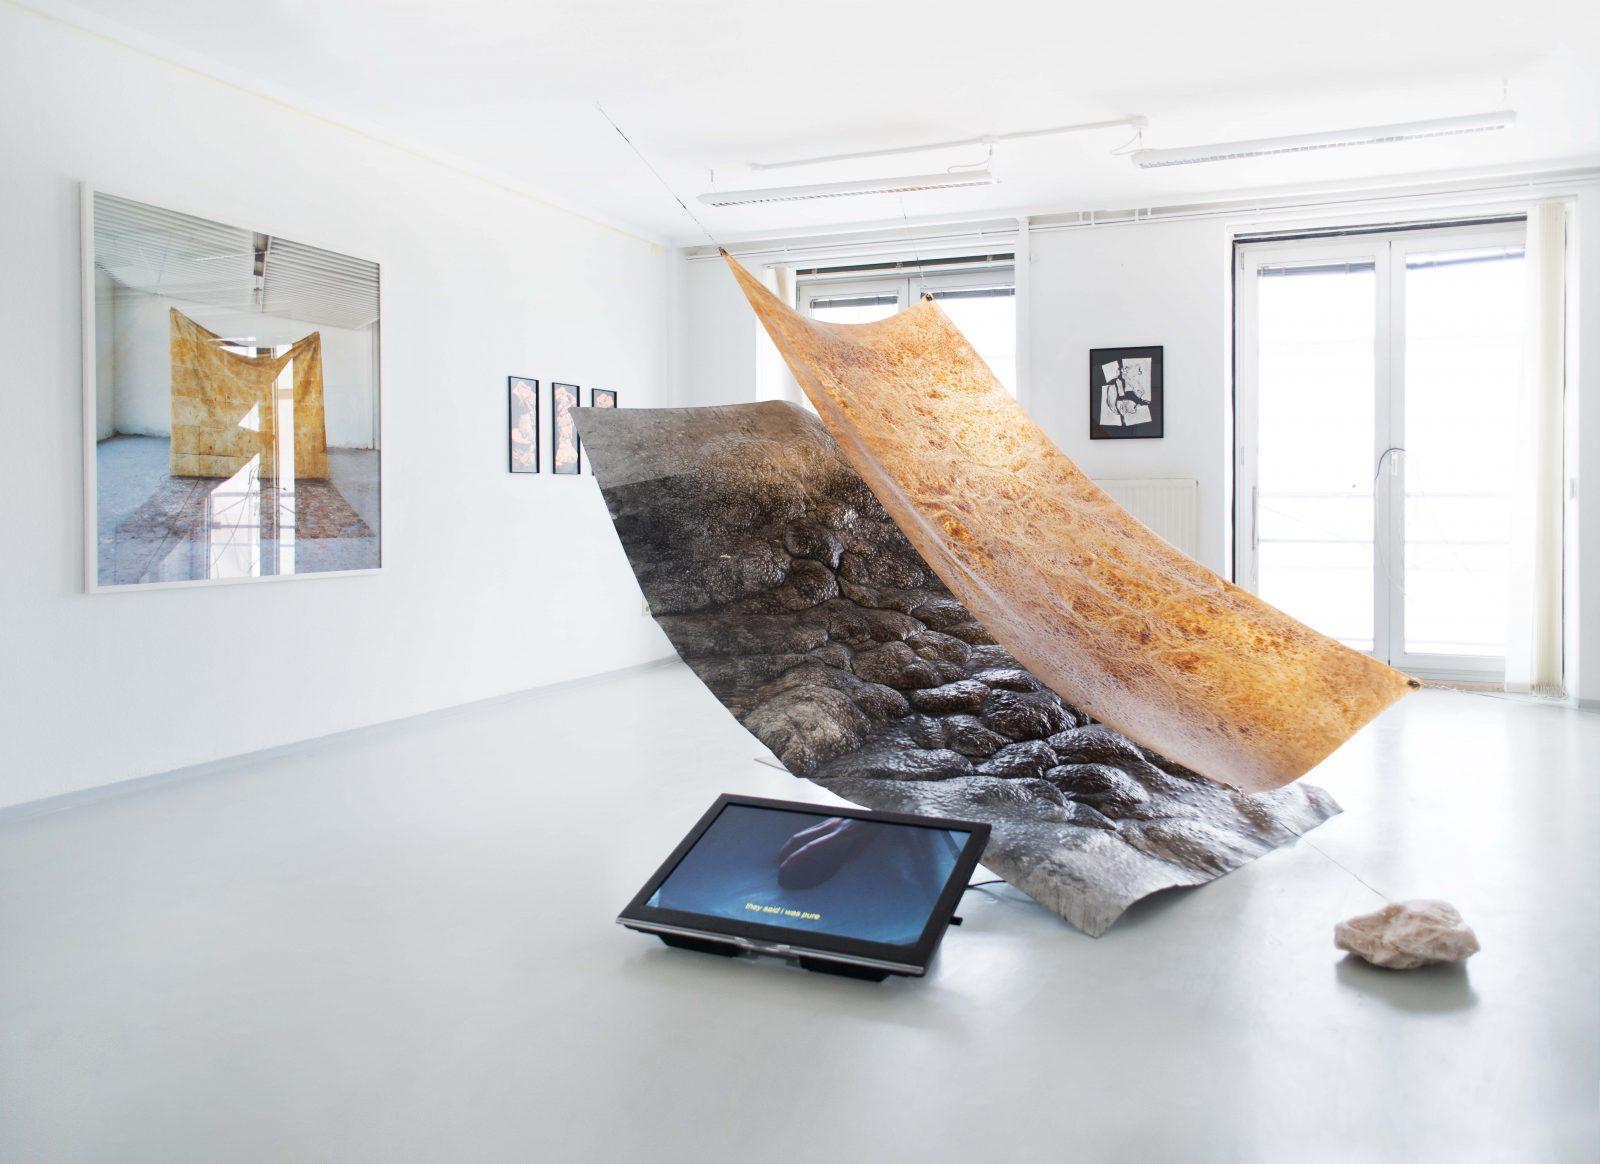 NÖ Waldviertel Galerie Kunst - Kaja Clara Joo